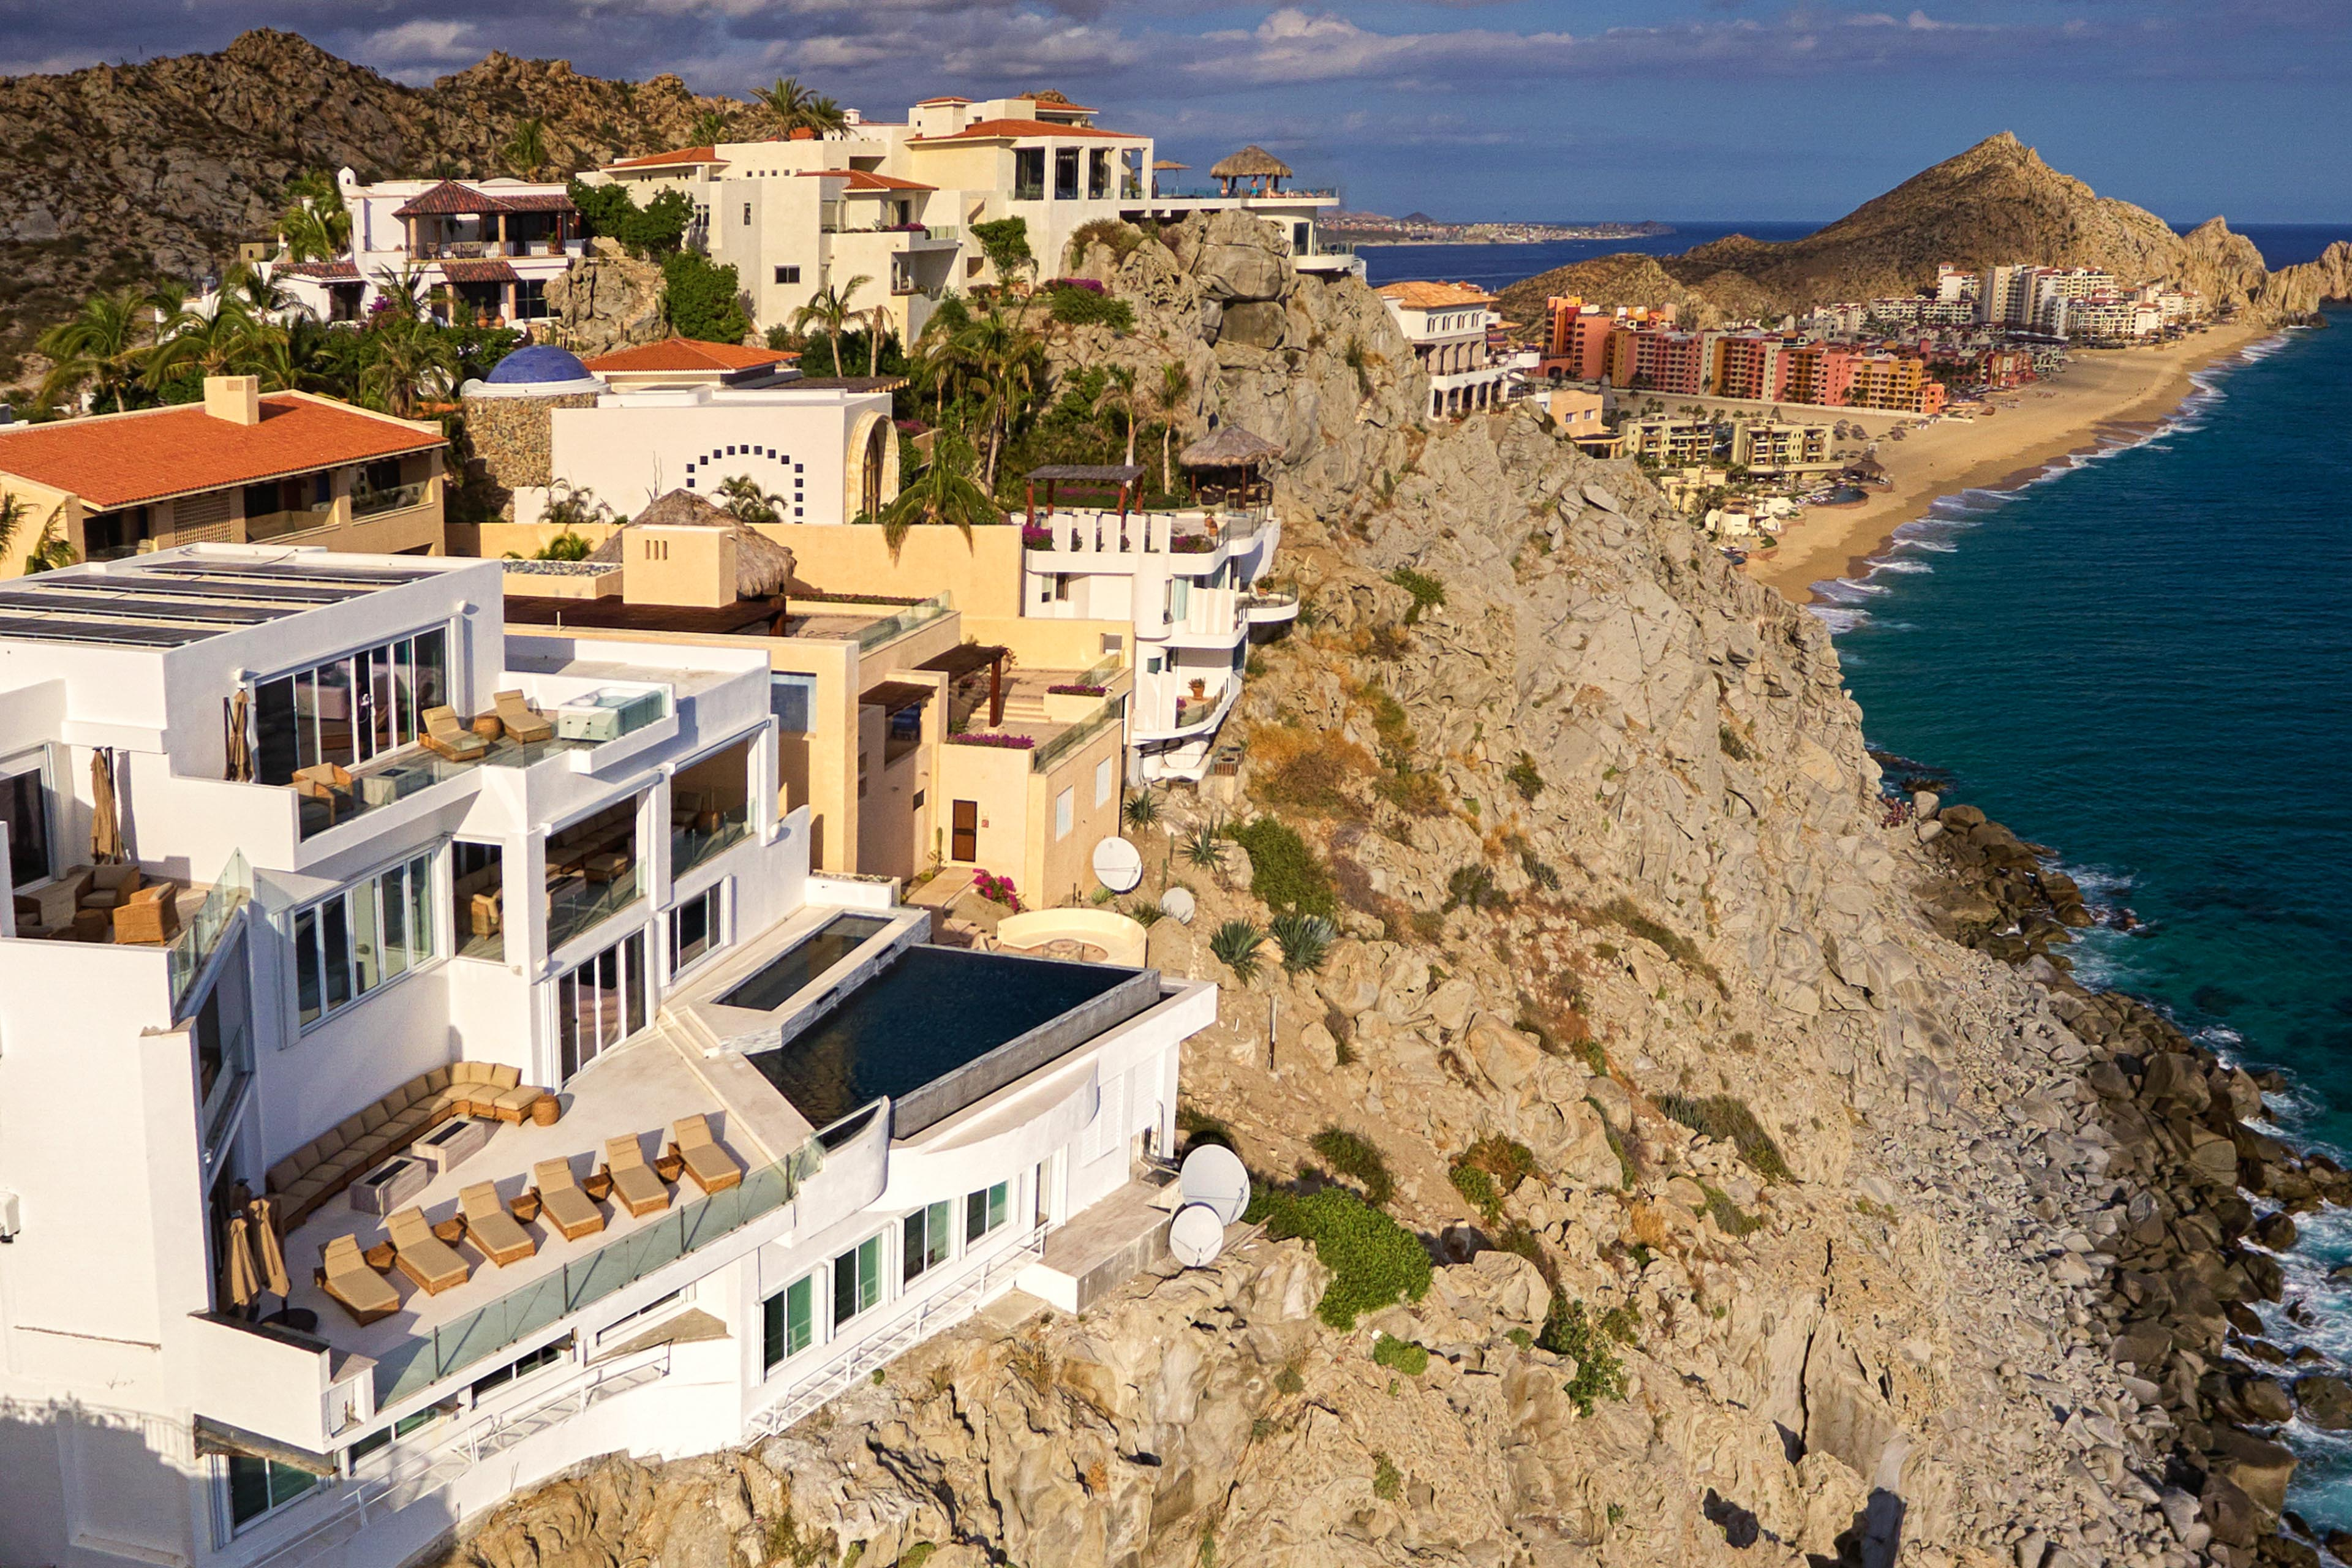 Cabovillas Com Cabo San Lucas Reviews Villa Lands End